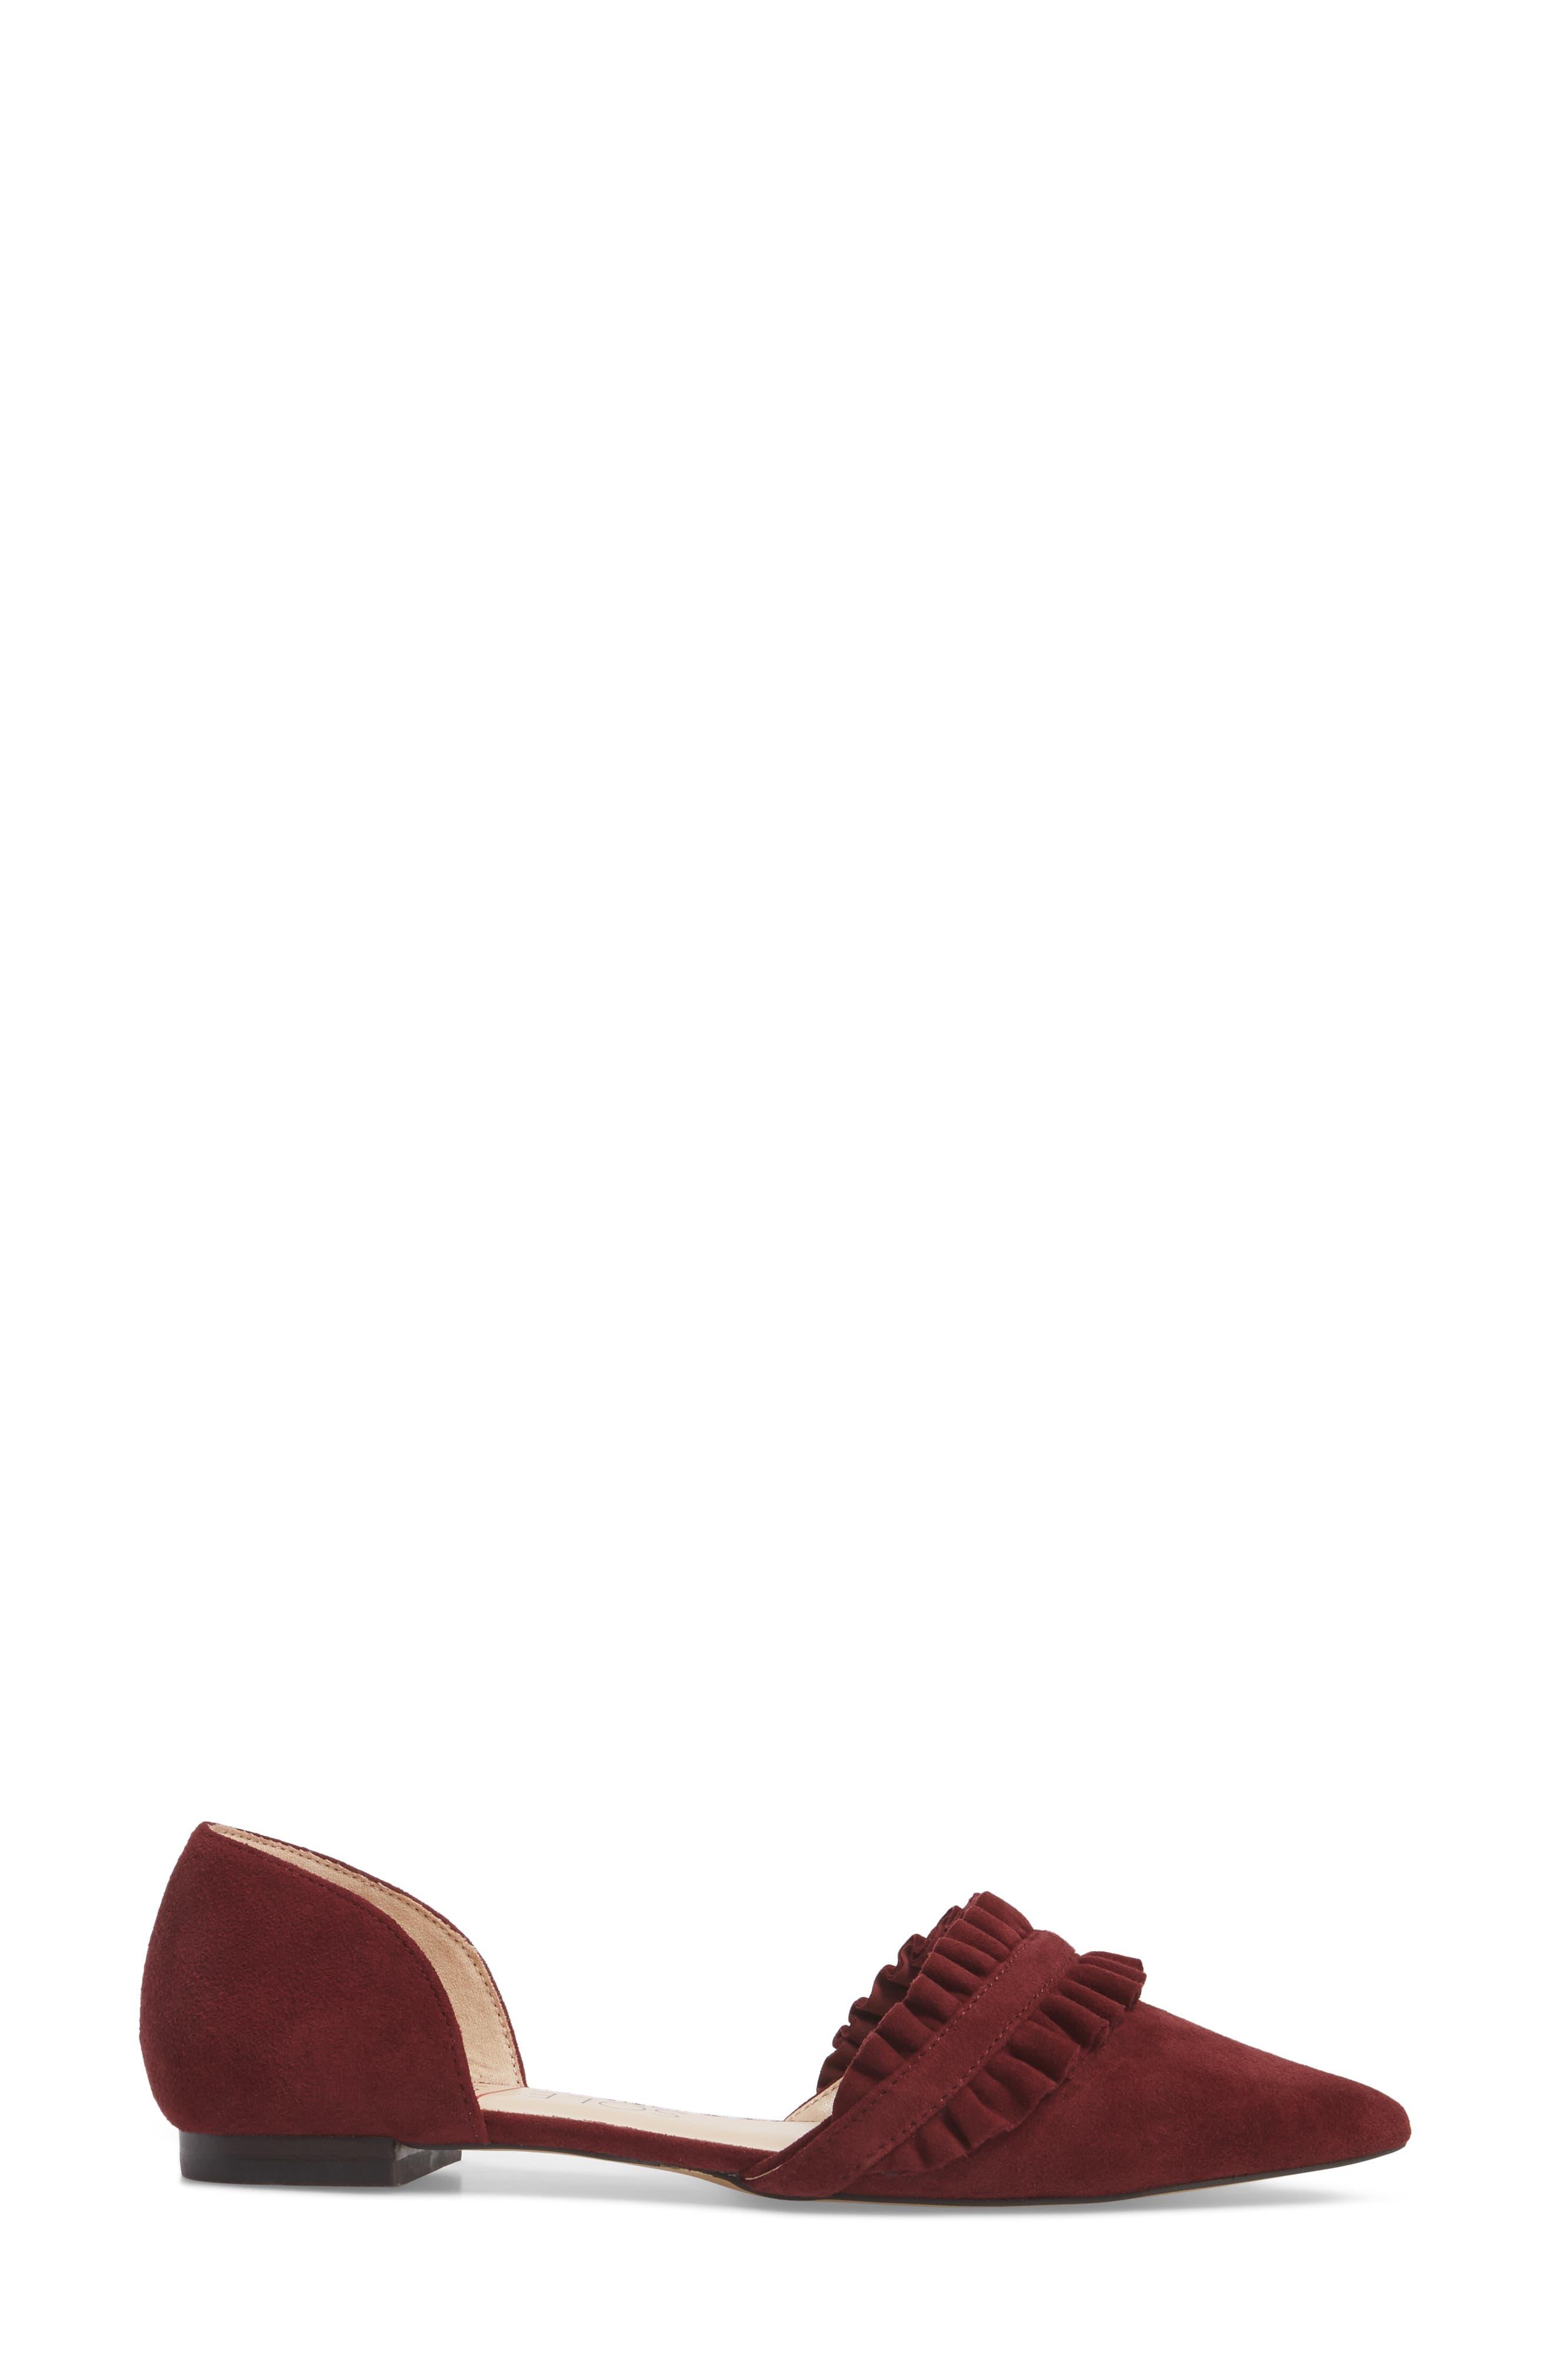 Alternate Image 3  - Sole Society Rosalind Ruffle d'Orsay Flat (Women)